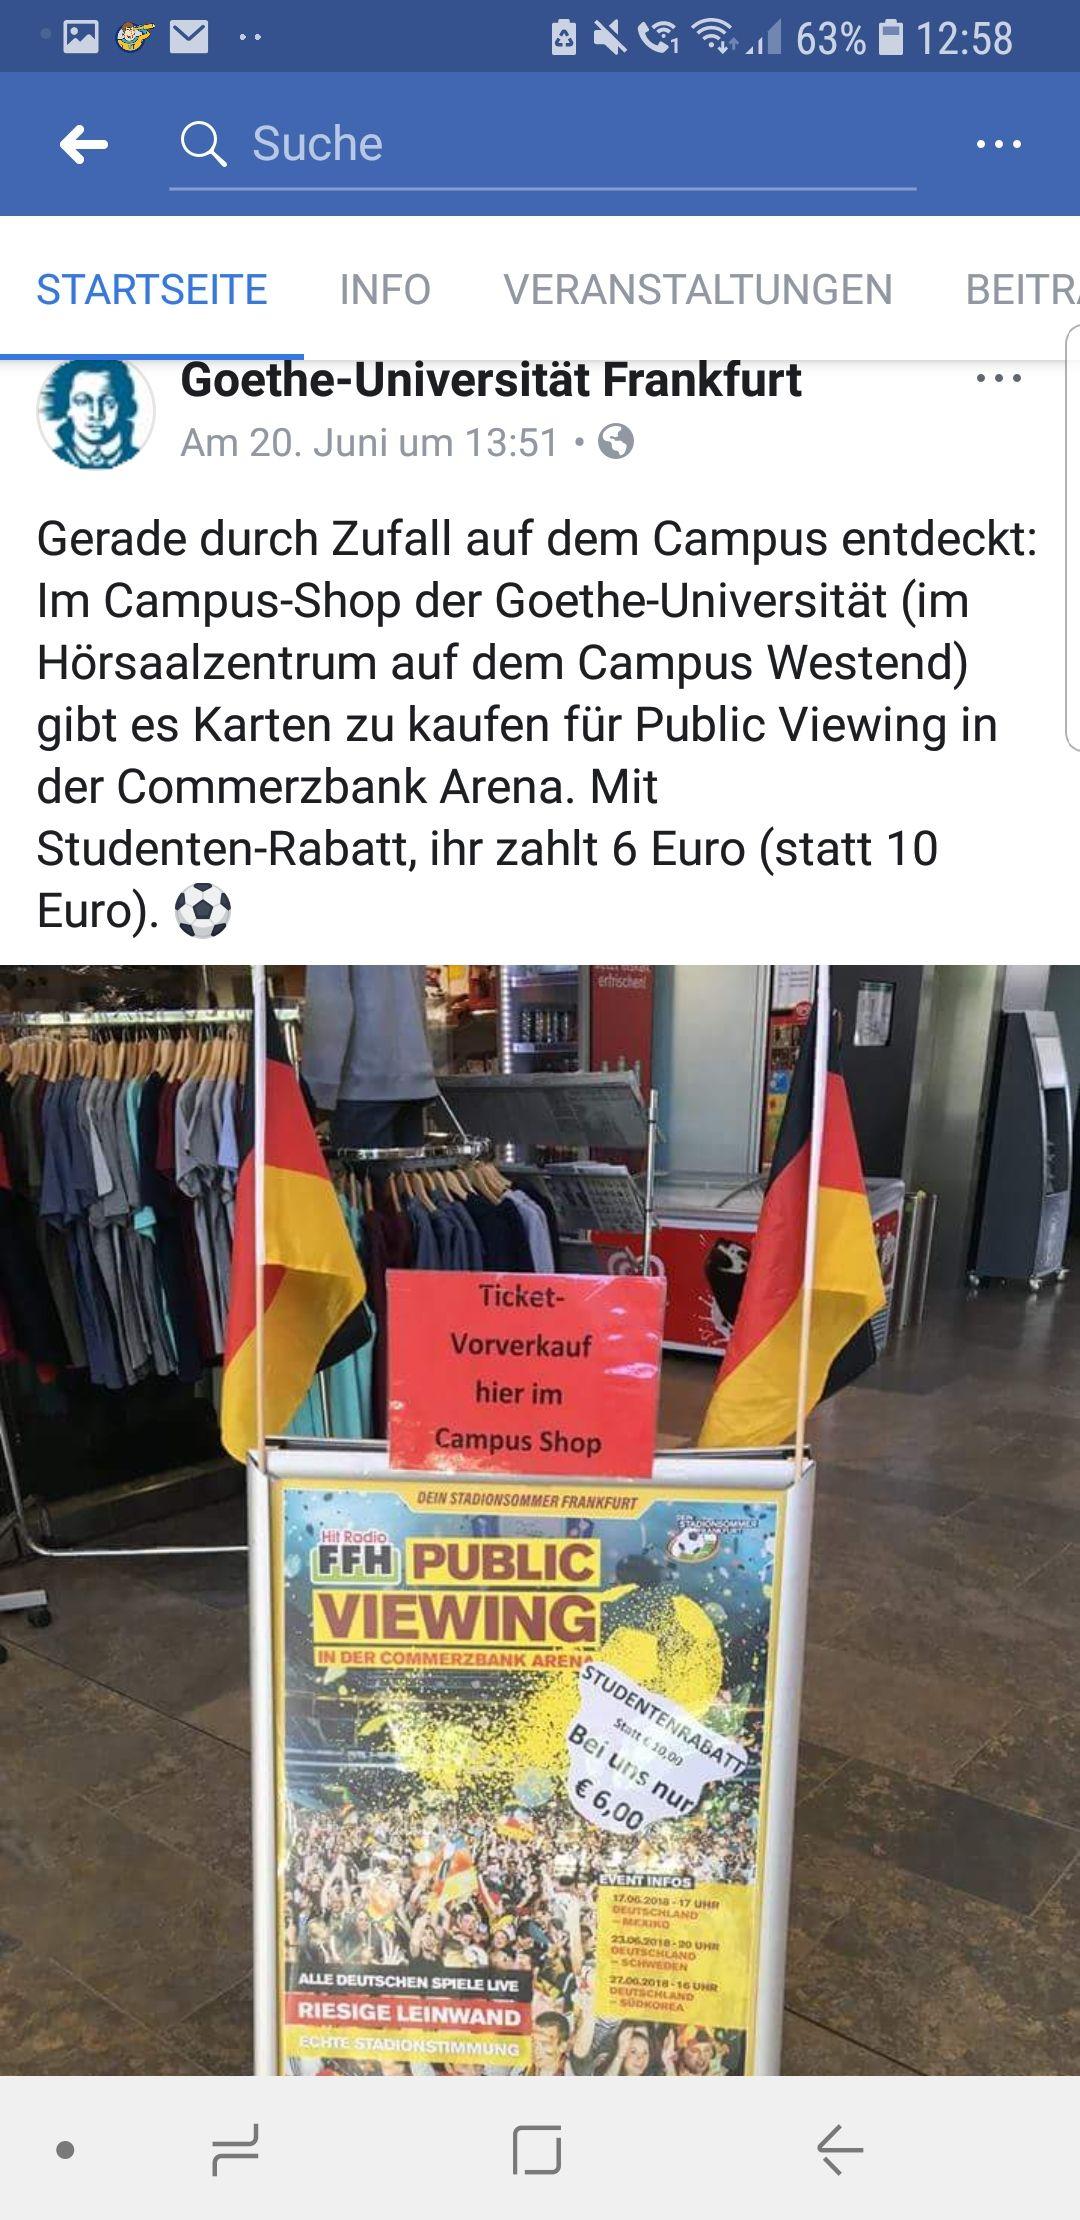 [Lokal Goethe Uni Frankfurt + nur für Studenten] Public Viewing CoBa-Arena